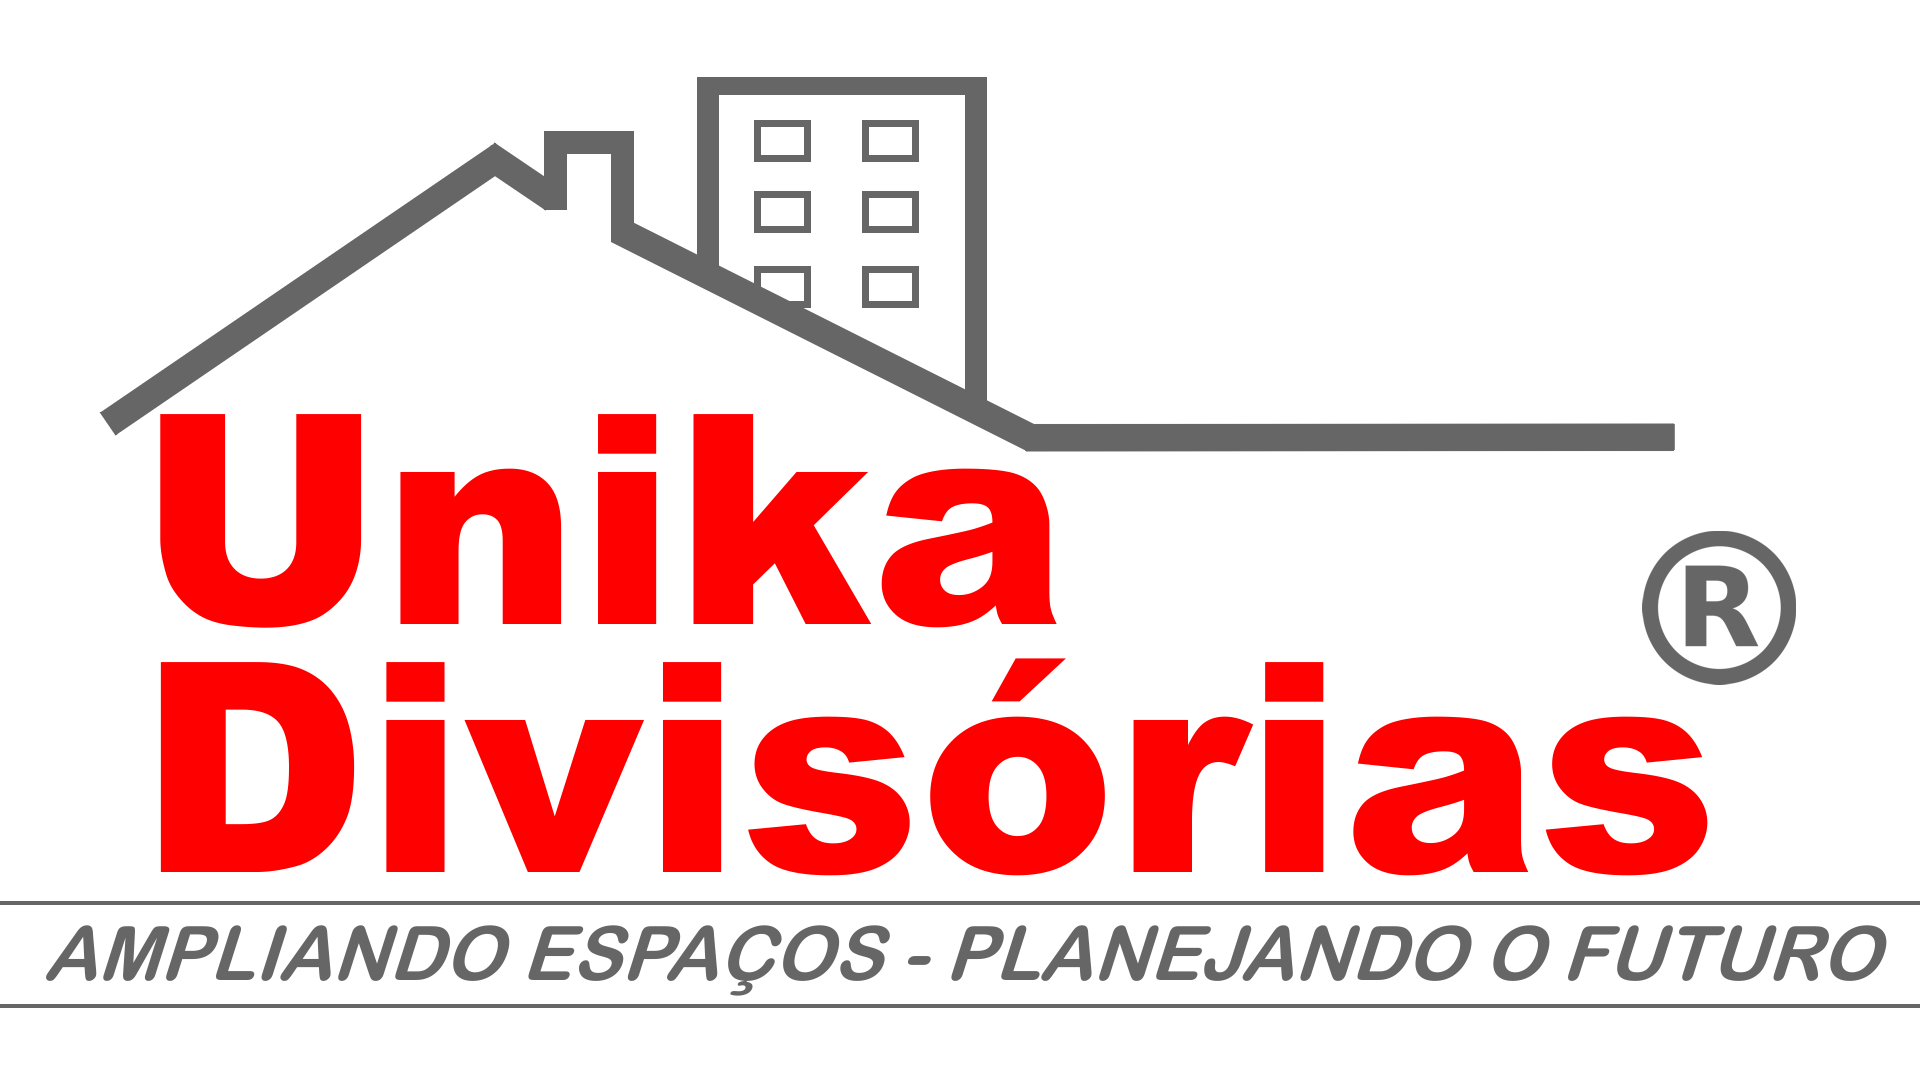 Logo Unika Divisórias title=